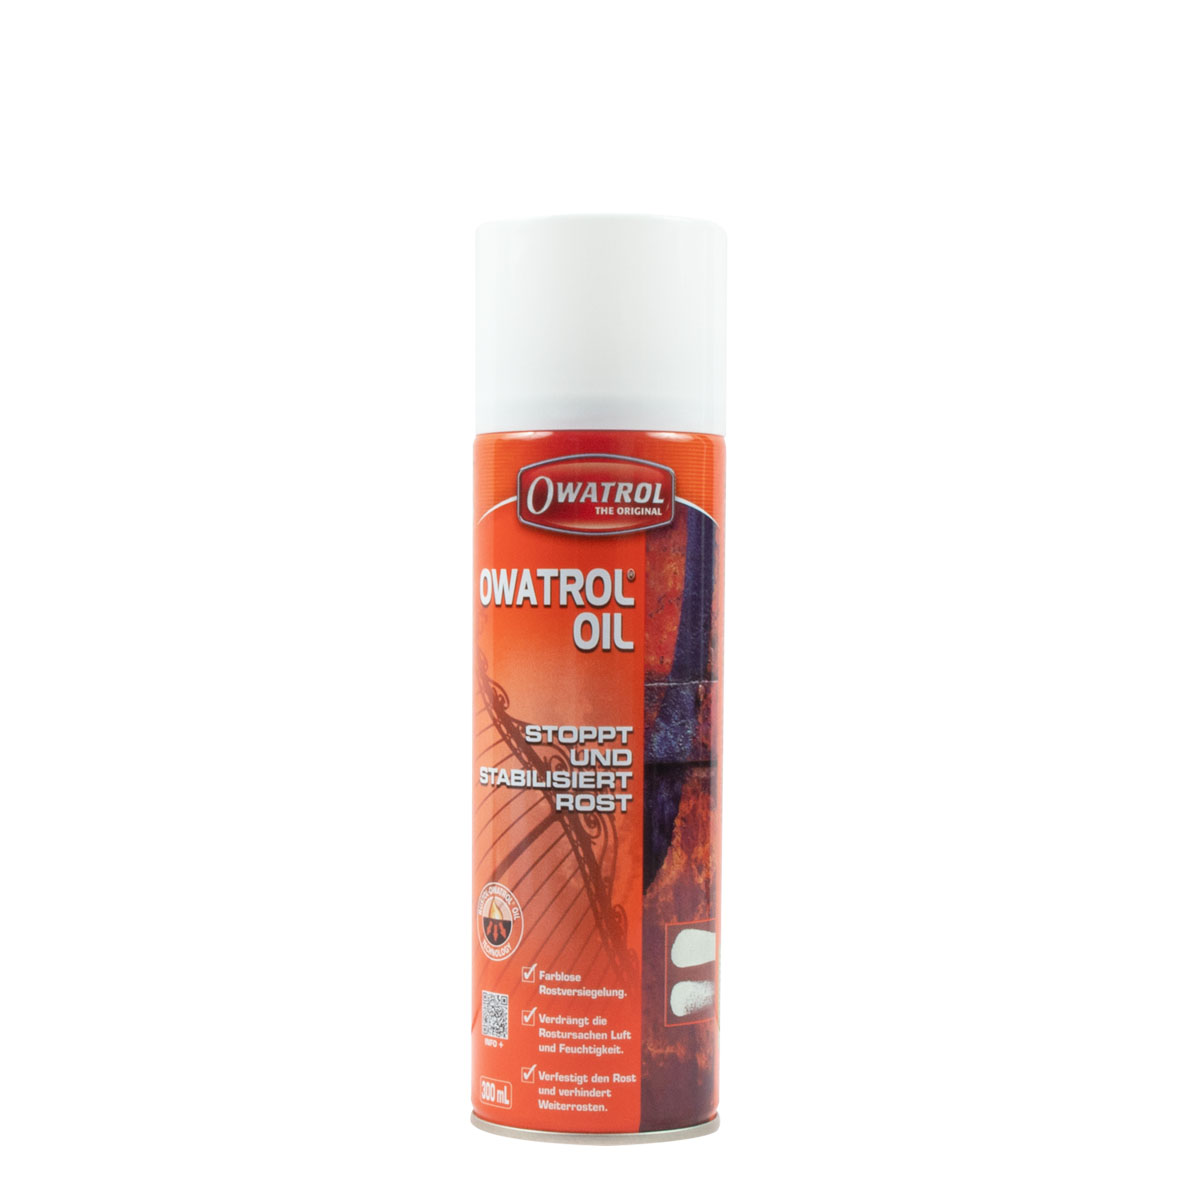 Owatrol Oel Spray 300ml, Kriechöl, Rostumwandler